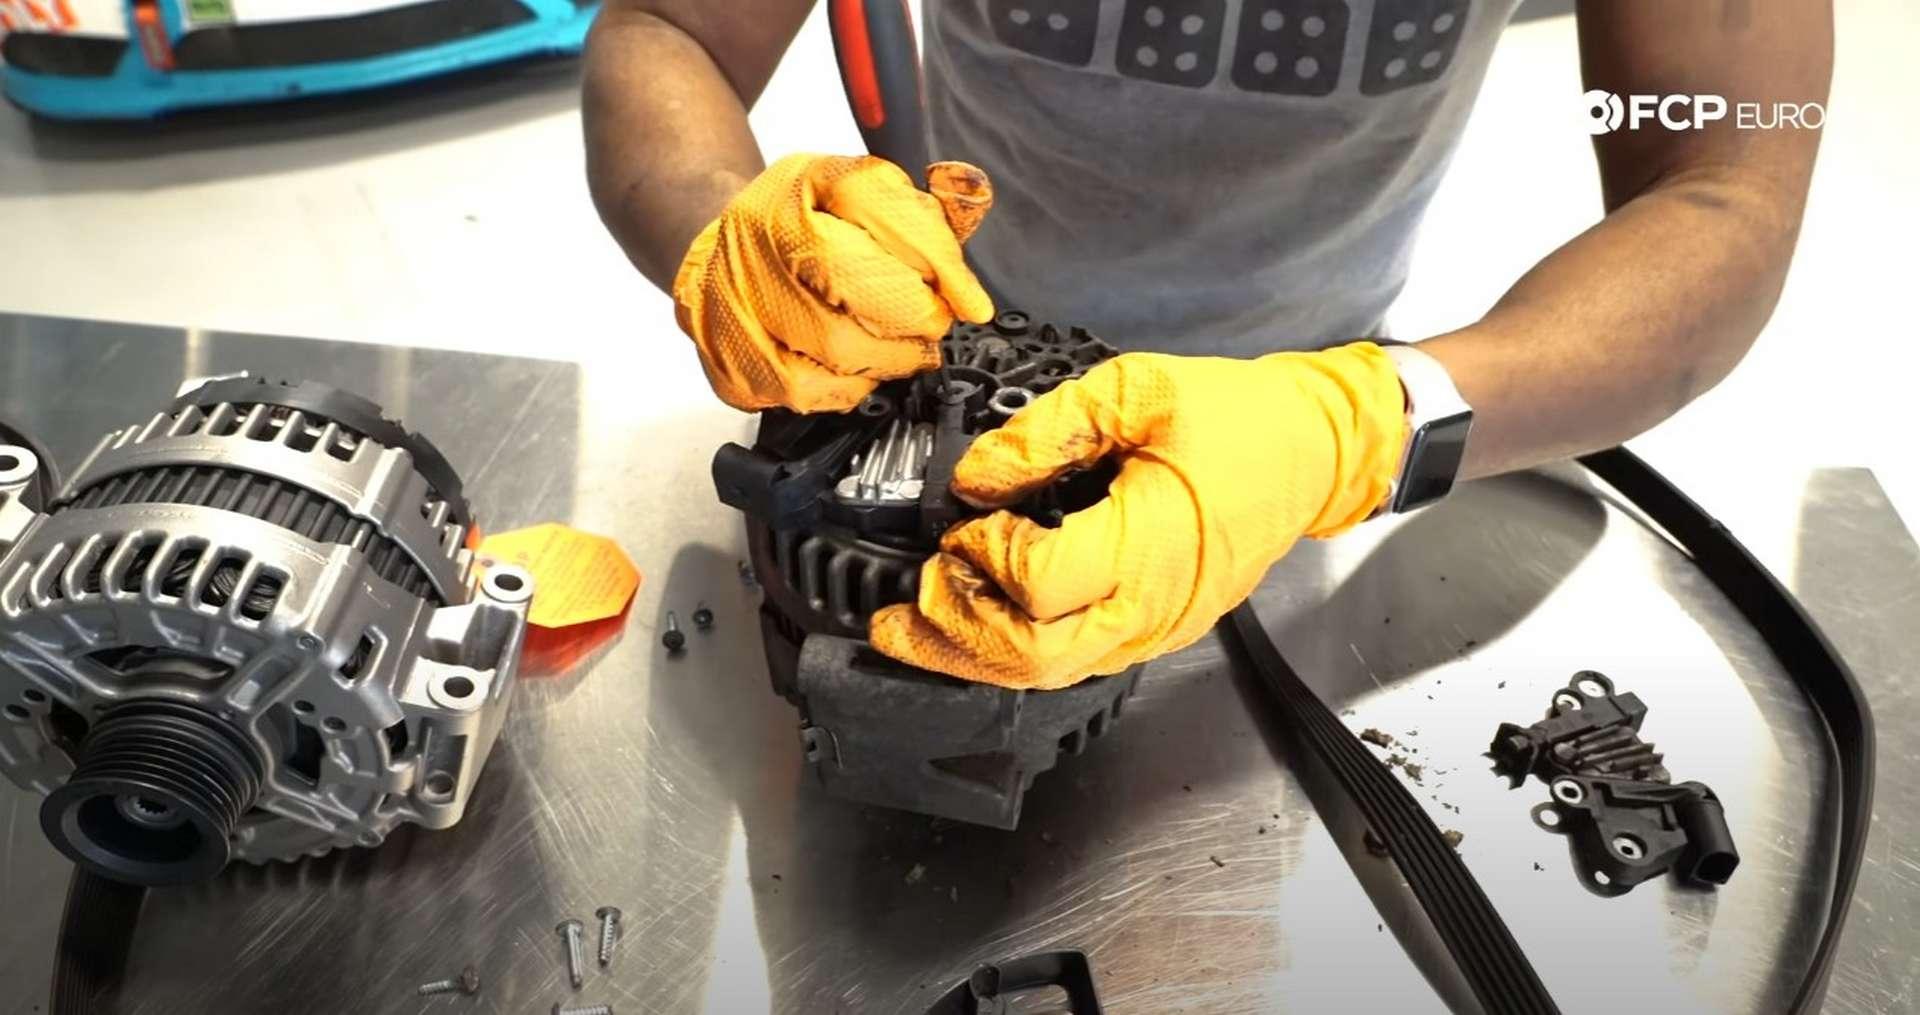 DIY Mercedes W212/204 Alternator and Drive Belt Replacement installing the new voltage regulator